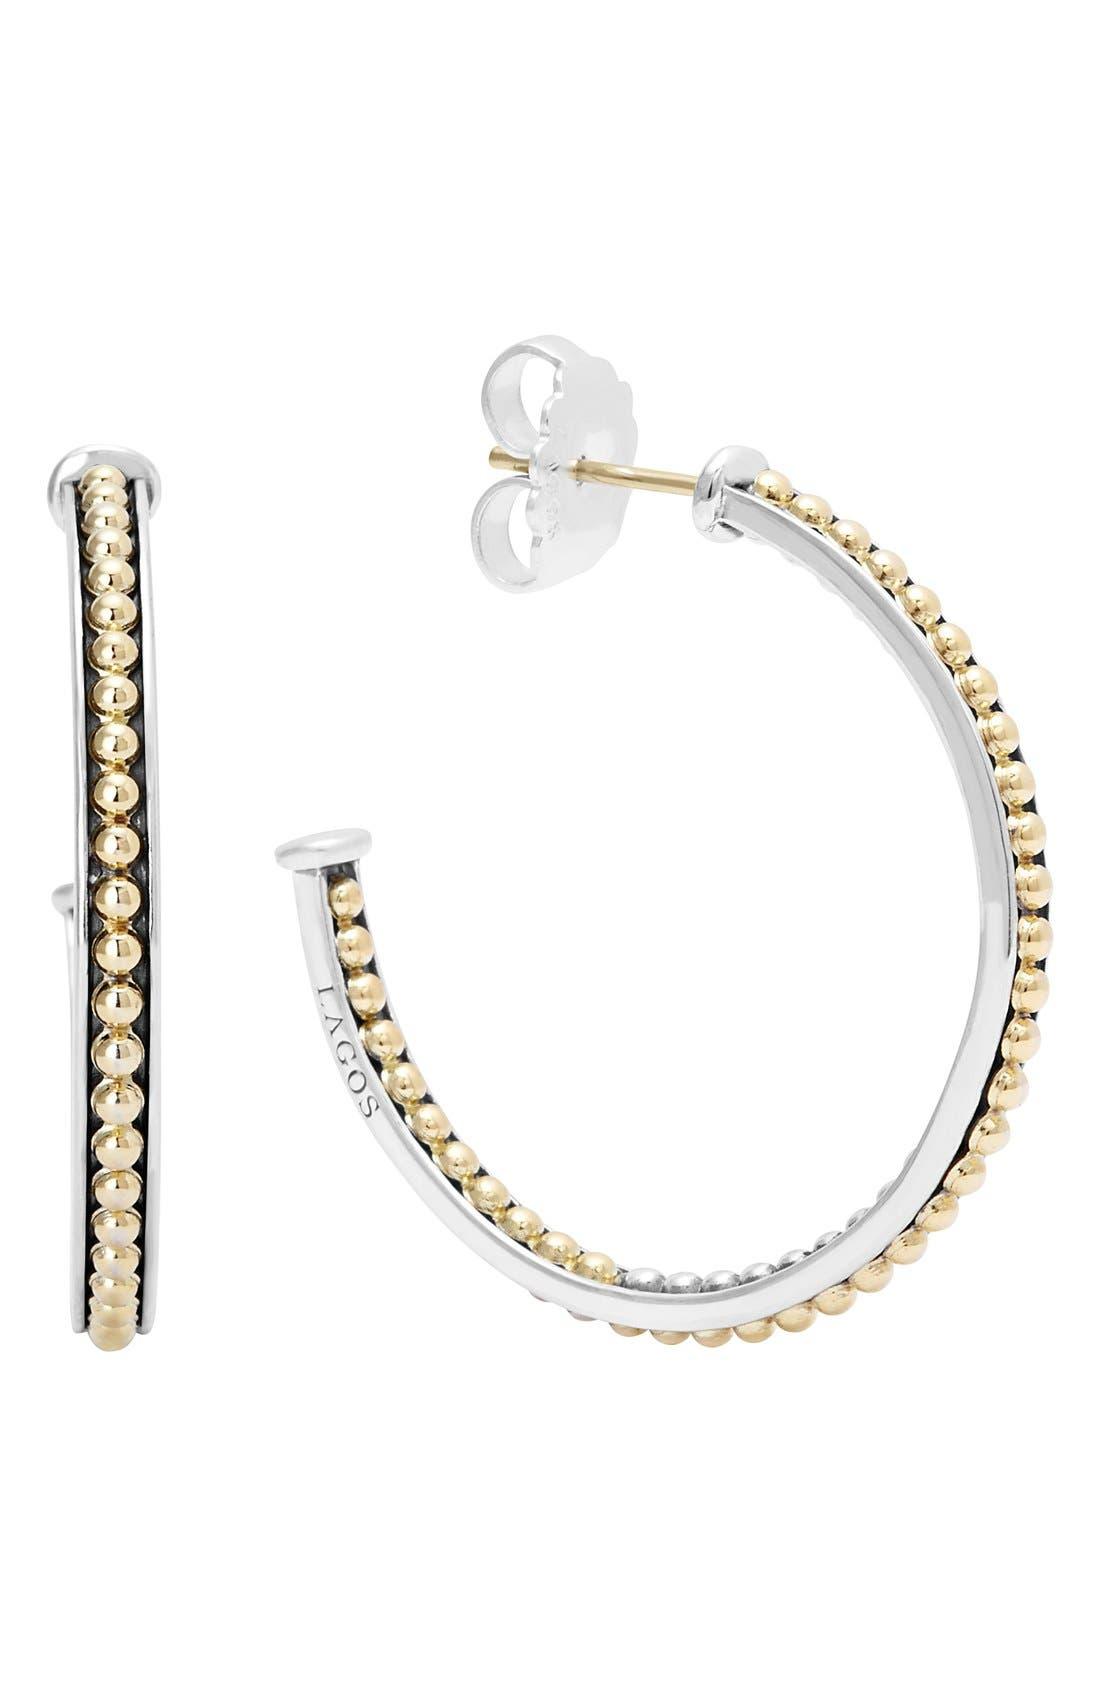 'Enso' Caviar Hoop Earrings,                         Main,                         color, SILVER/ GOLD